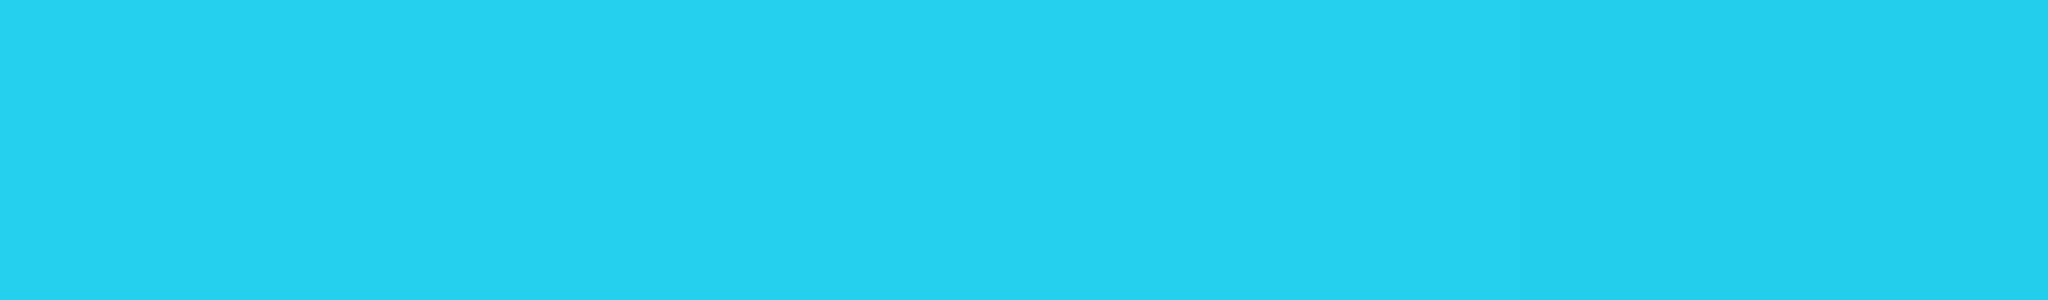 HU 155515 ABS hrana modrá azur hladká lesk 90°